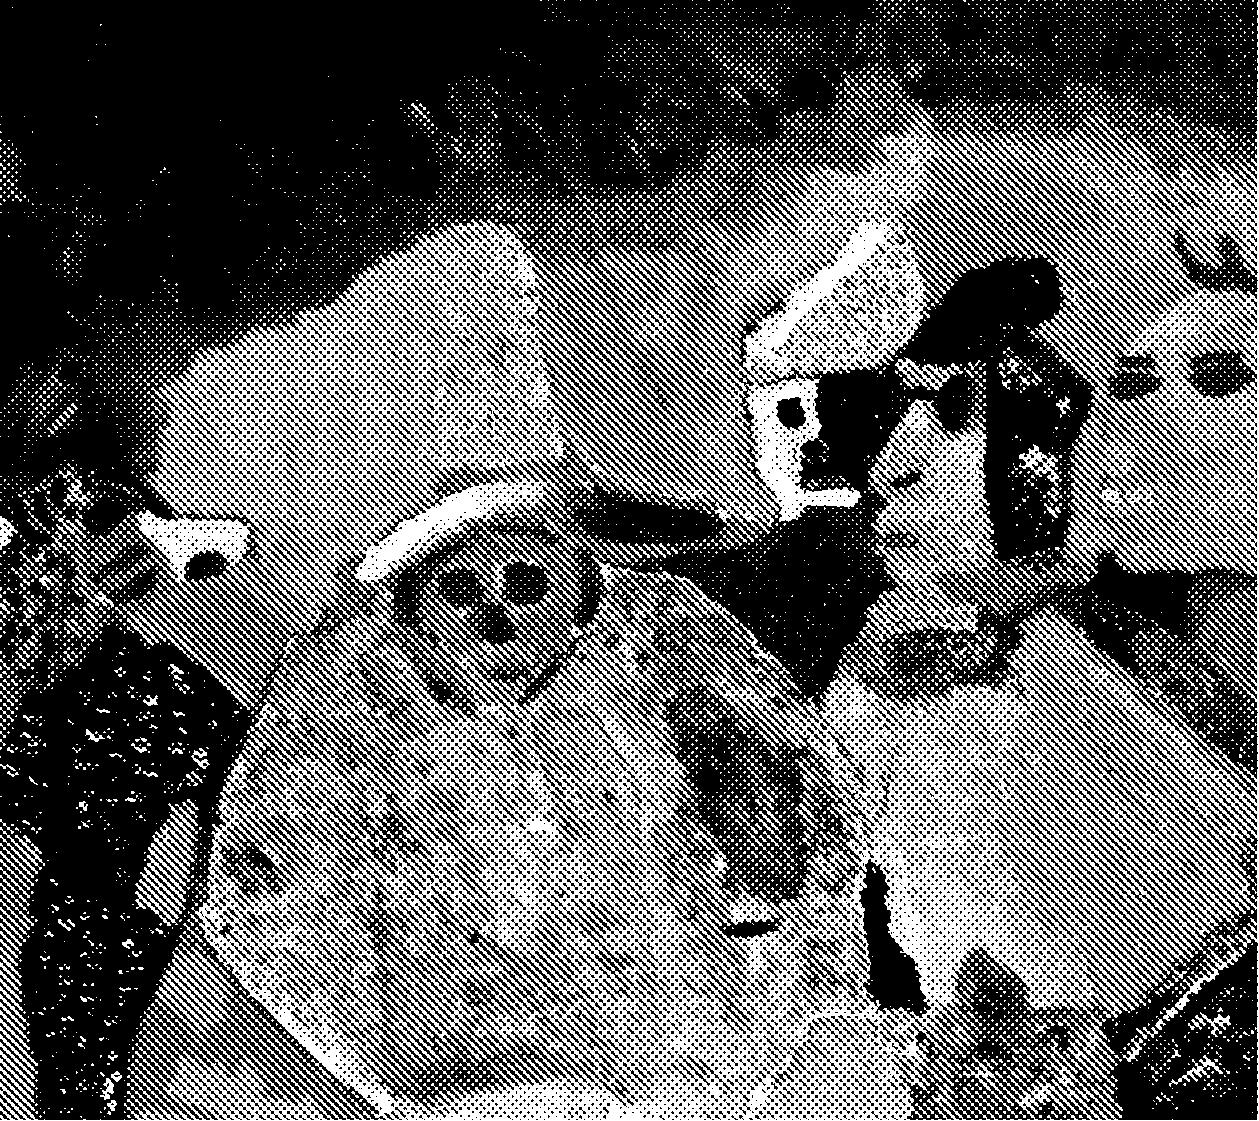 UYATI POG (BAR) -w/ WARTONE + M WITCH + SHUJI TERAYAMA